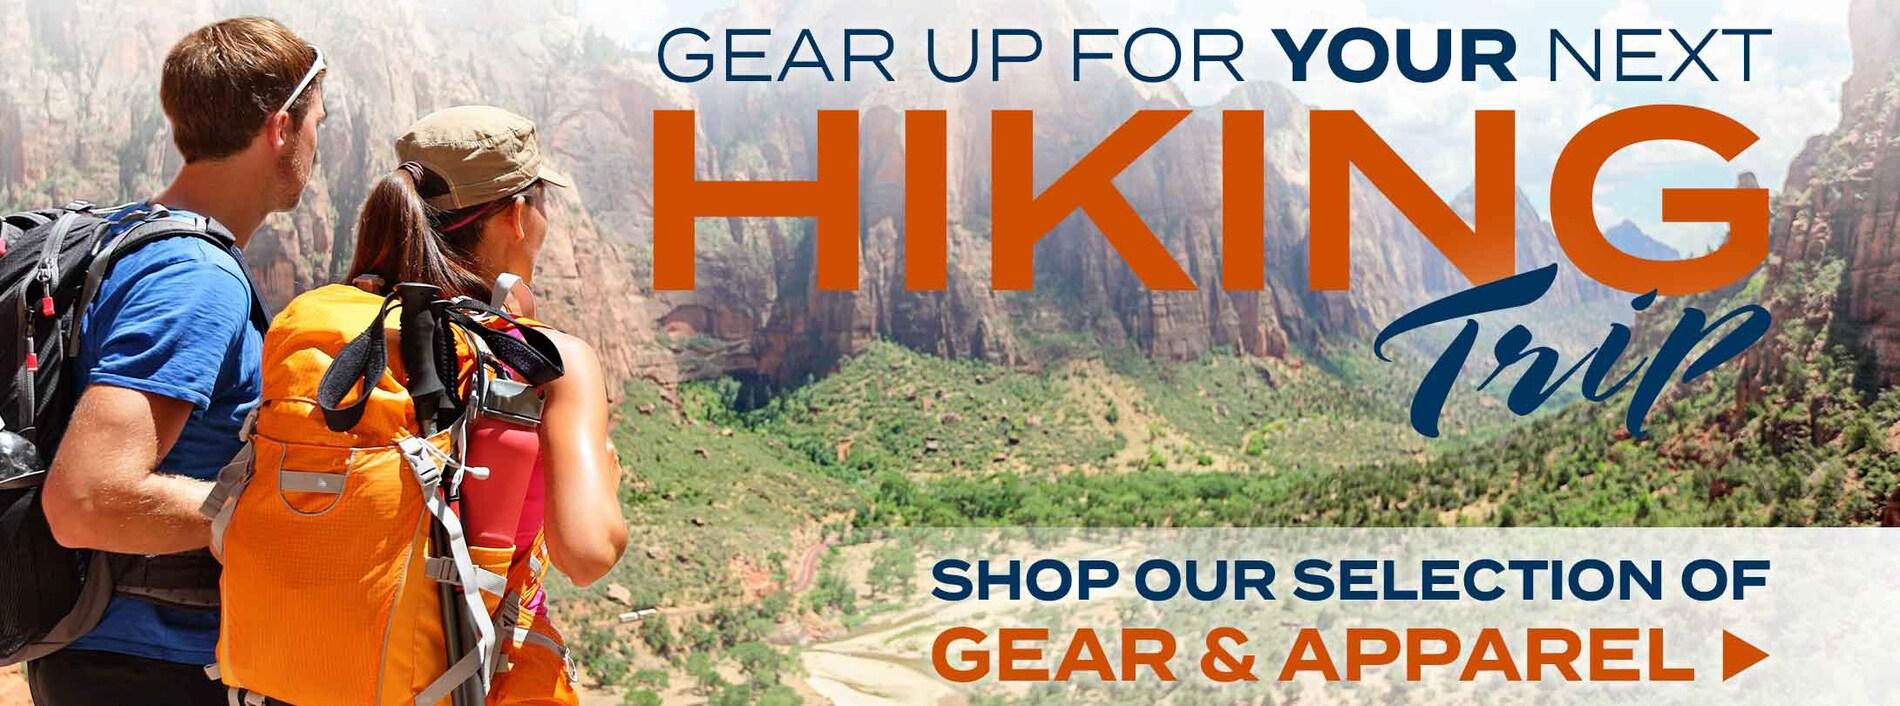 Hiking Clothing, Footwear & Gear